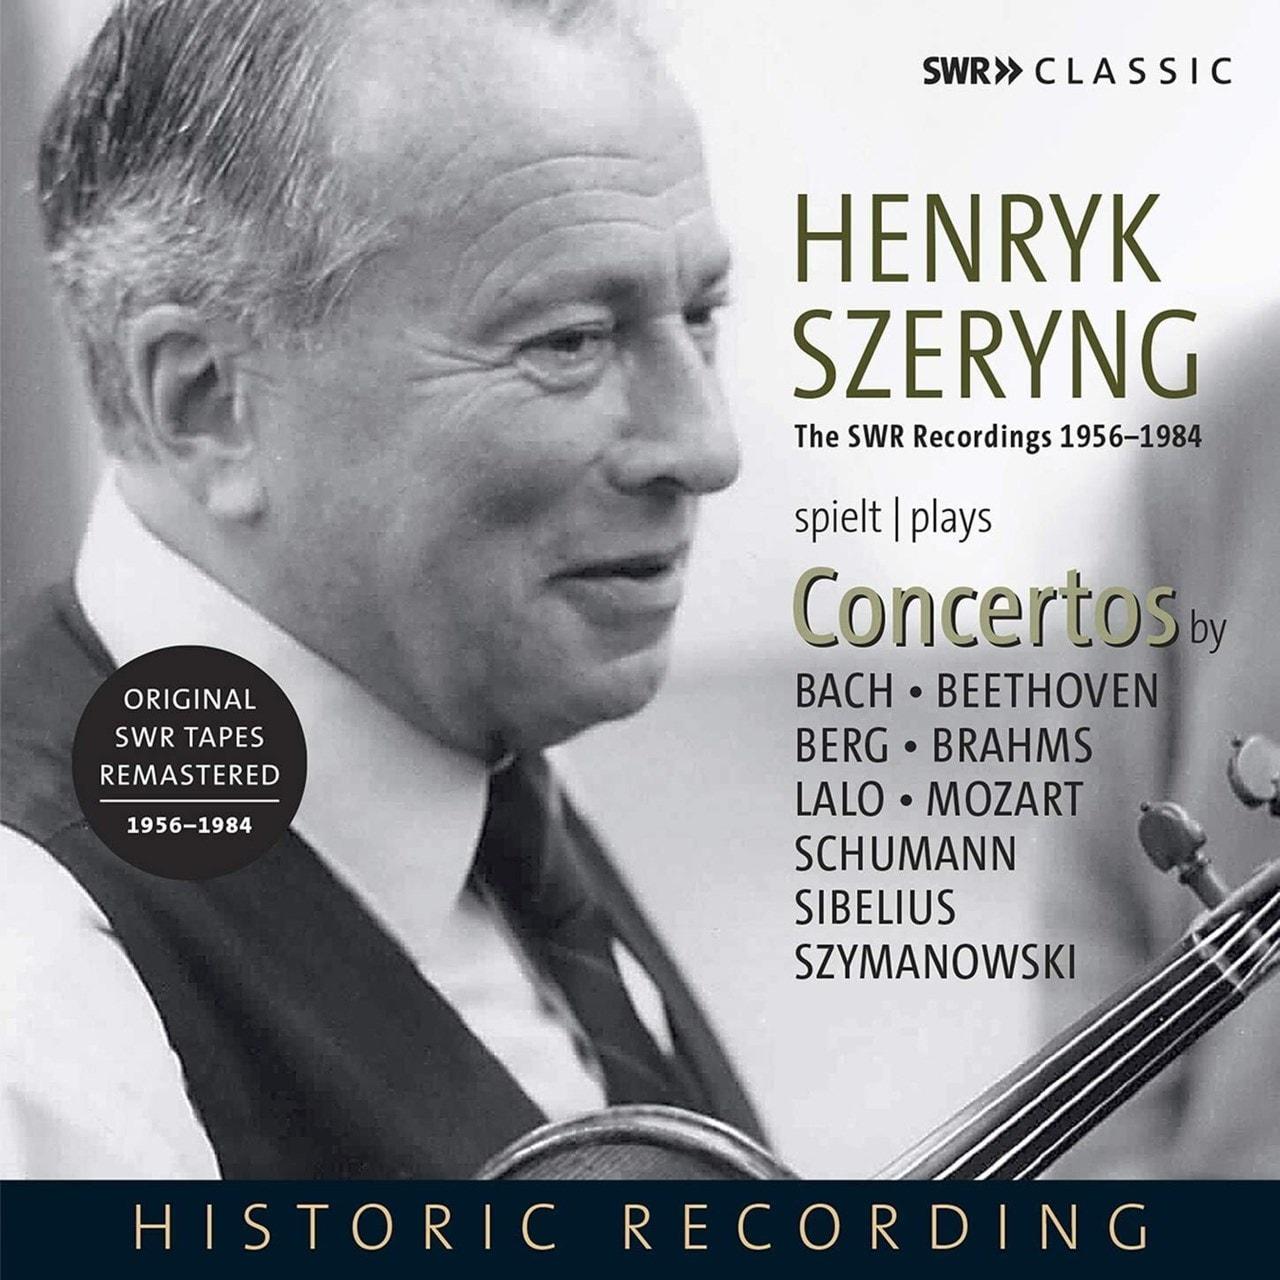 Henryk Szeryng Plays Concertos By Bach/Beethoven/Berg/Brahms/... - 1